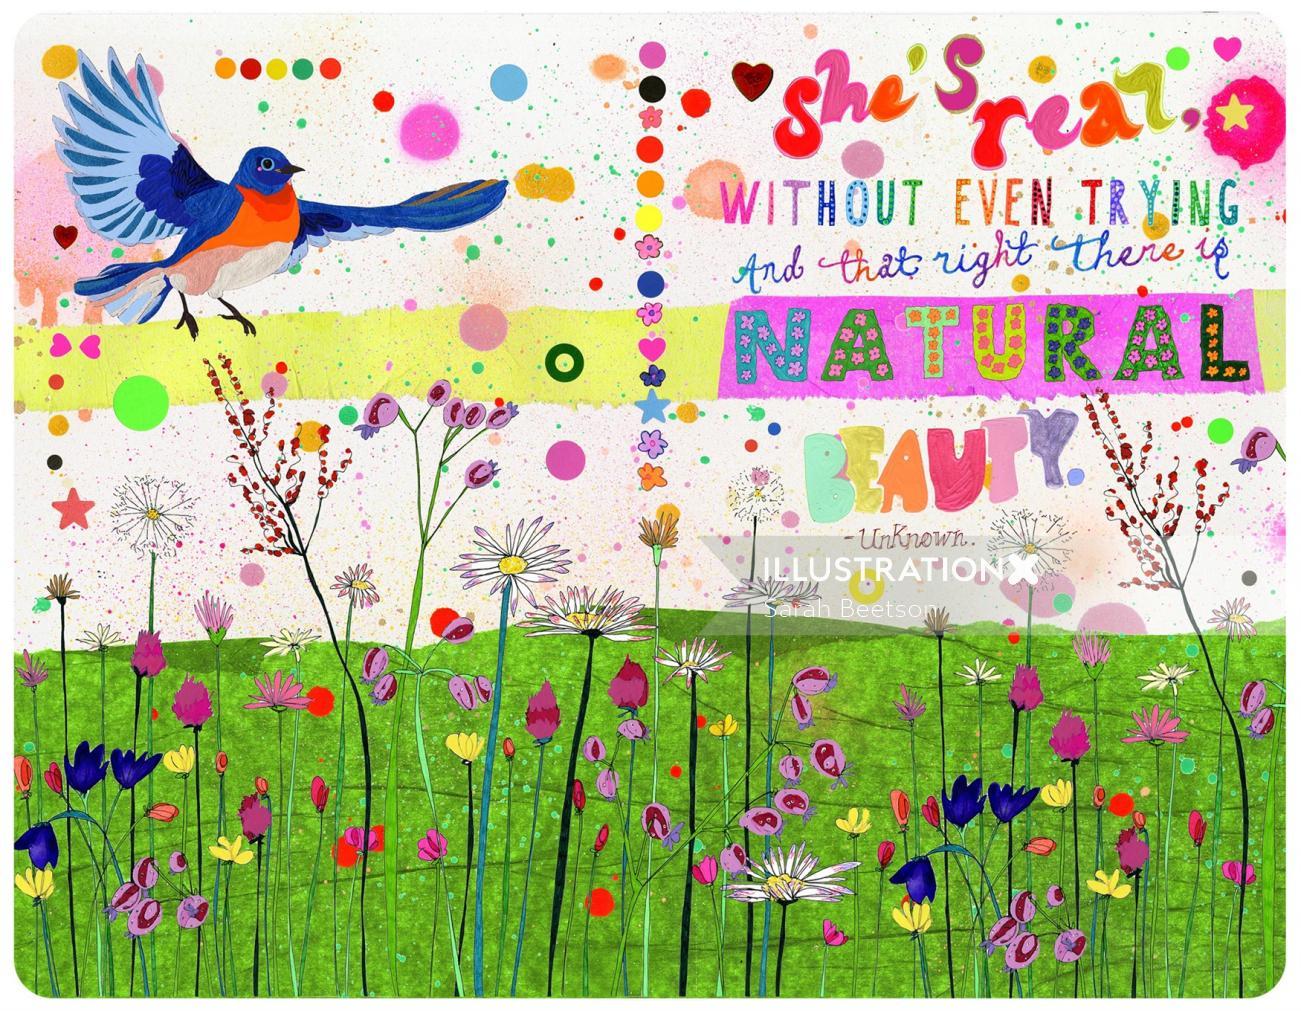 Bird flying - Illustration by Sarah Beetson